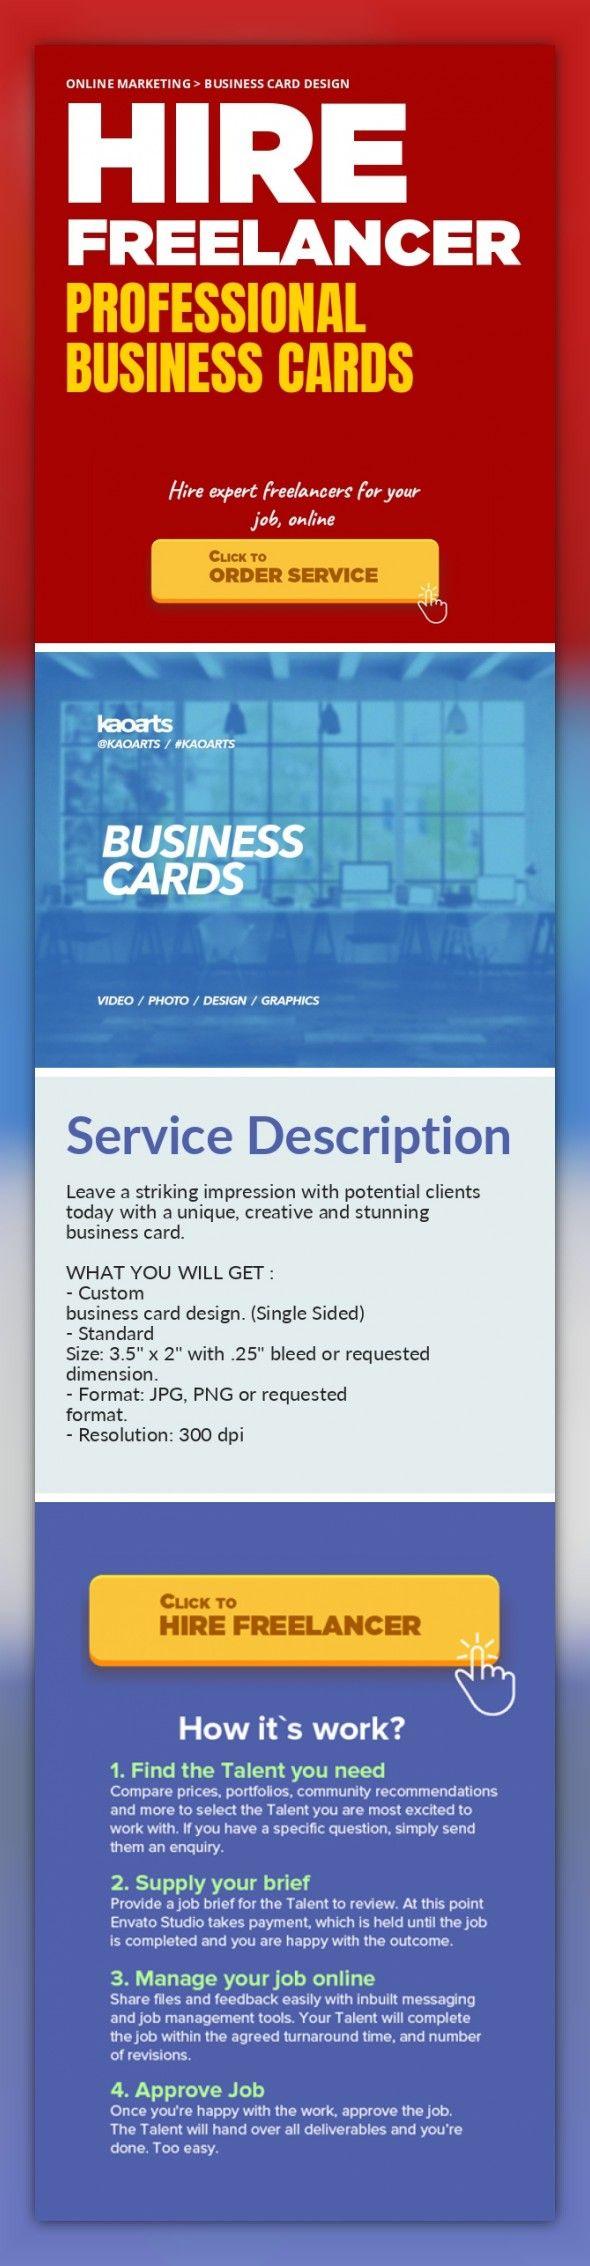 12827 best business cards images on Pinterest | Lipsense business ...